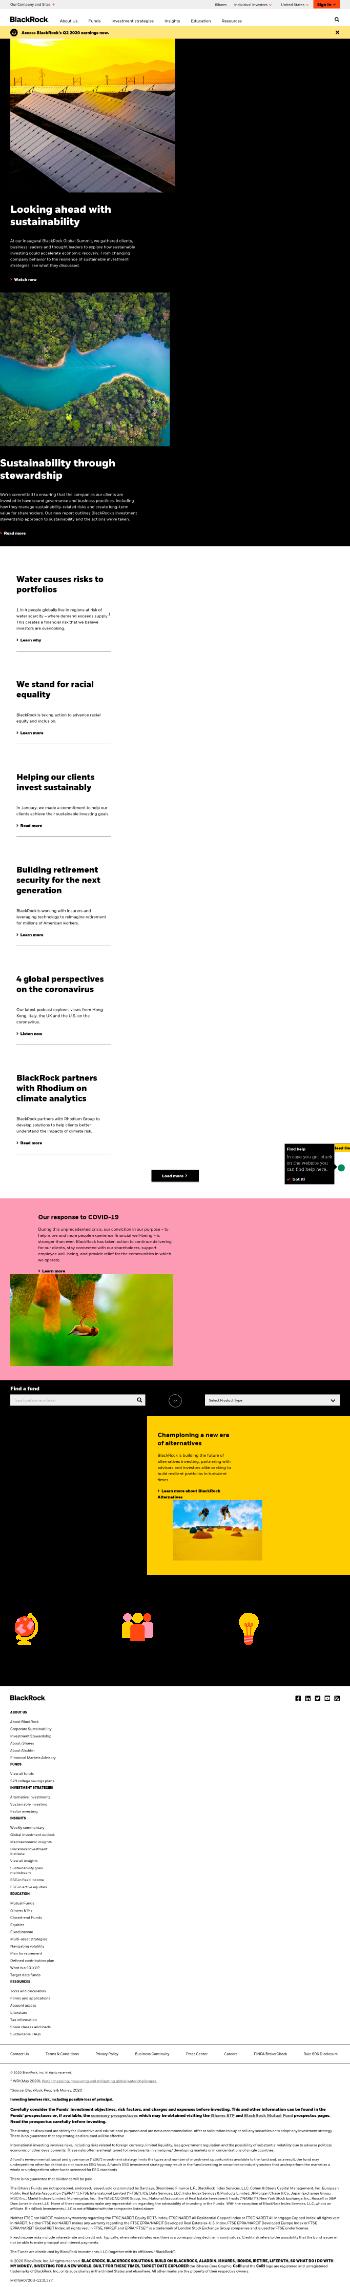 BlackRock MuniHoldings Quality Fund II, Inc. Website Screenshot